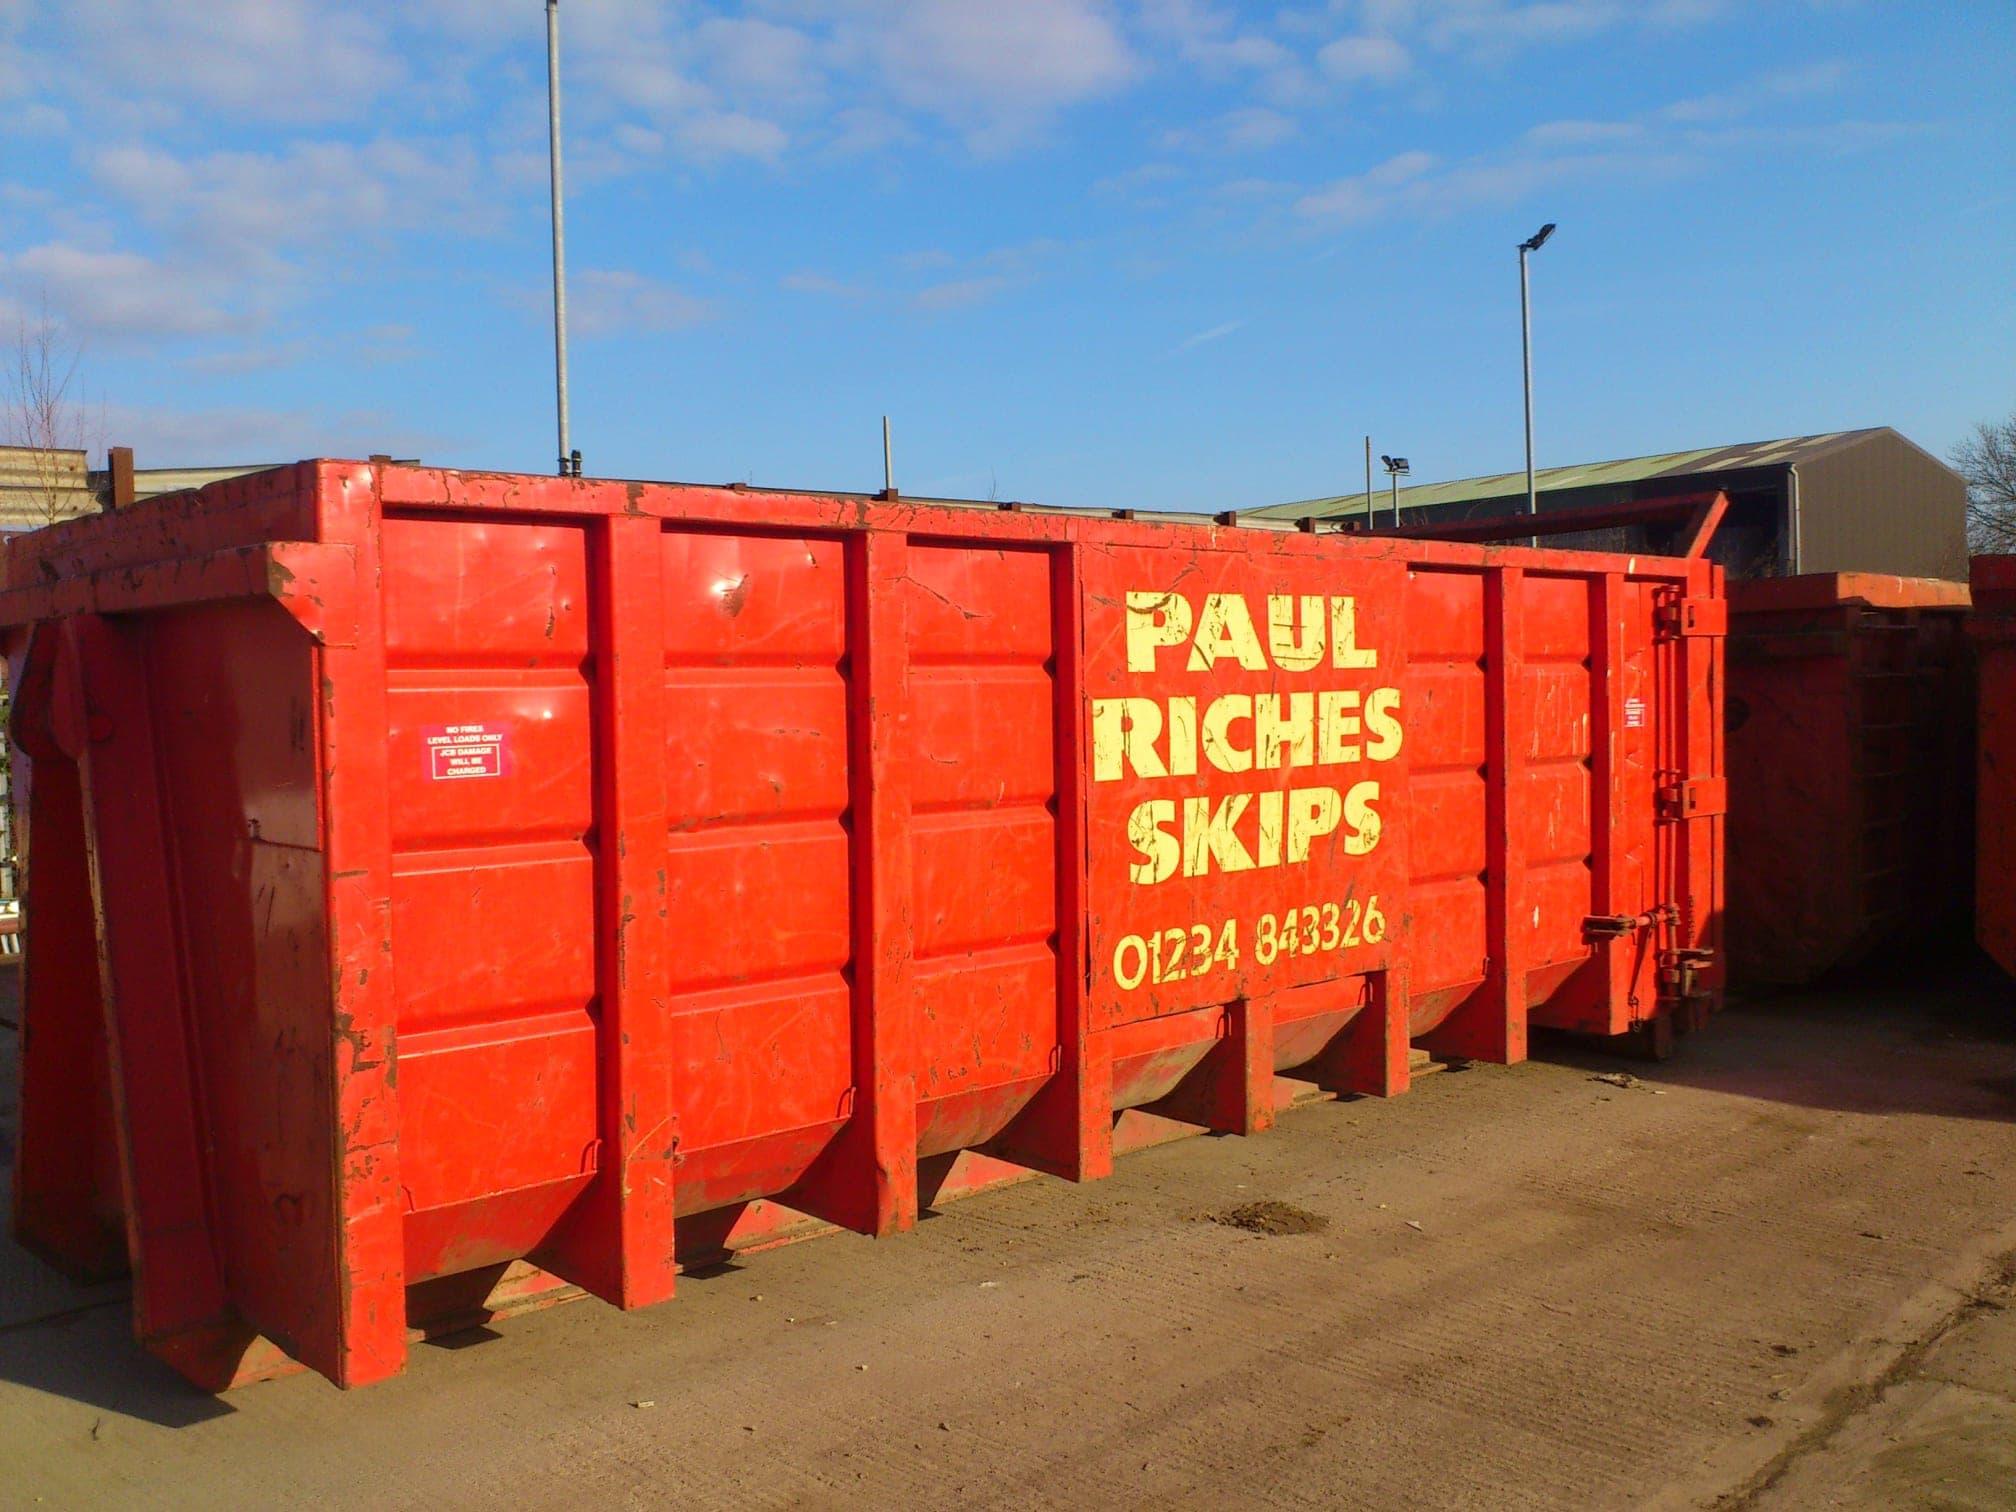 Paul Riches Skips Ltd